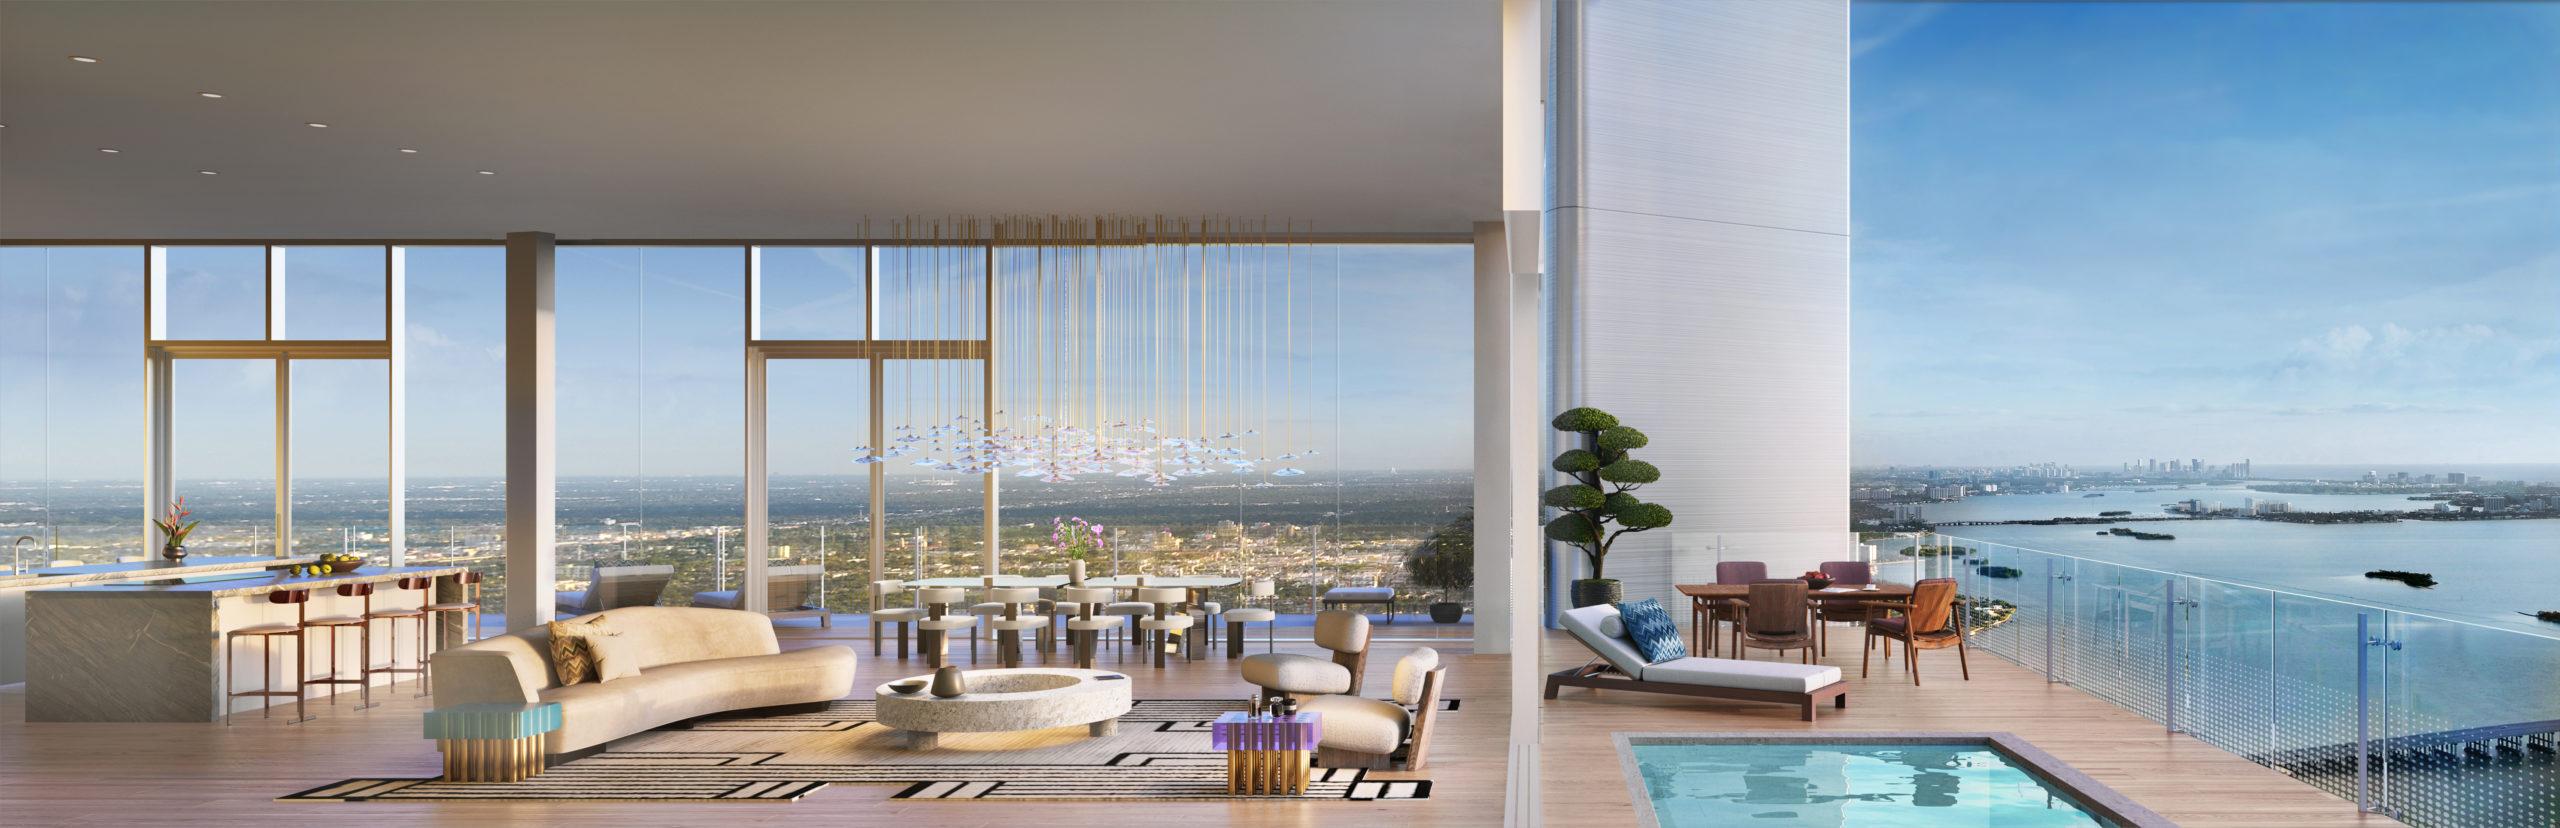 Miamicondosforsale_MissoniBaia_Architecture_Penthouse